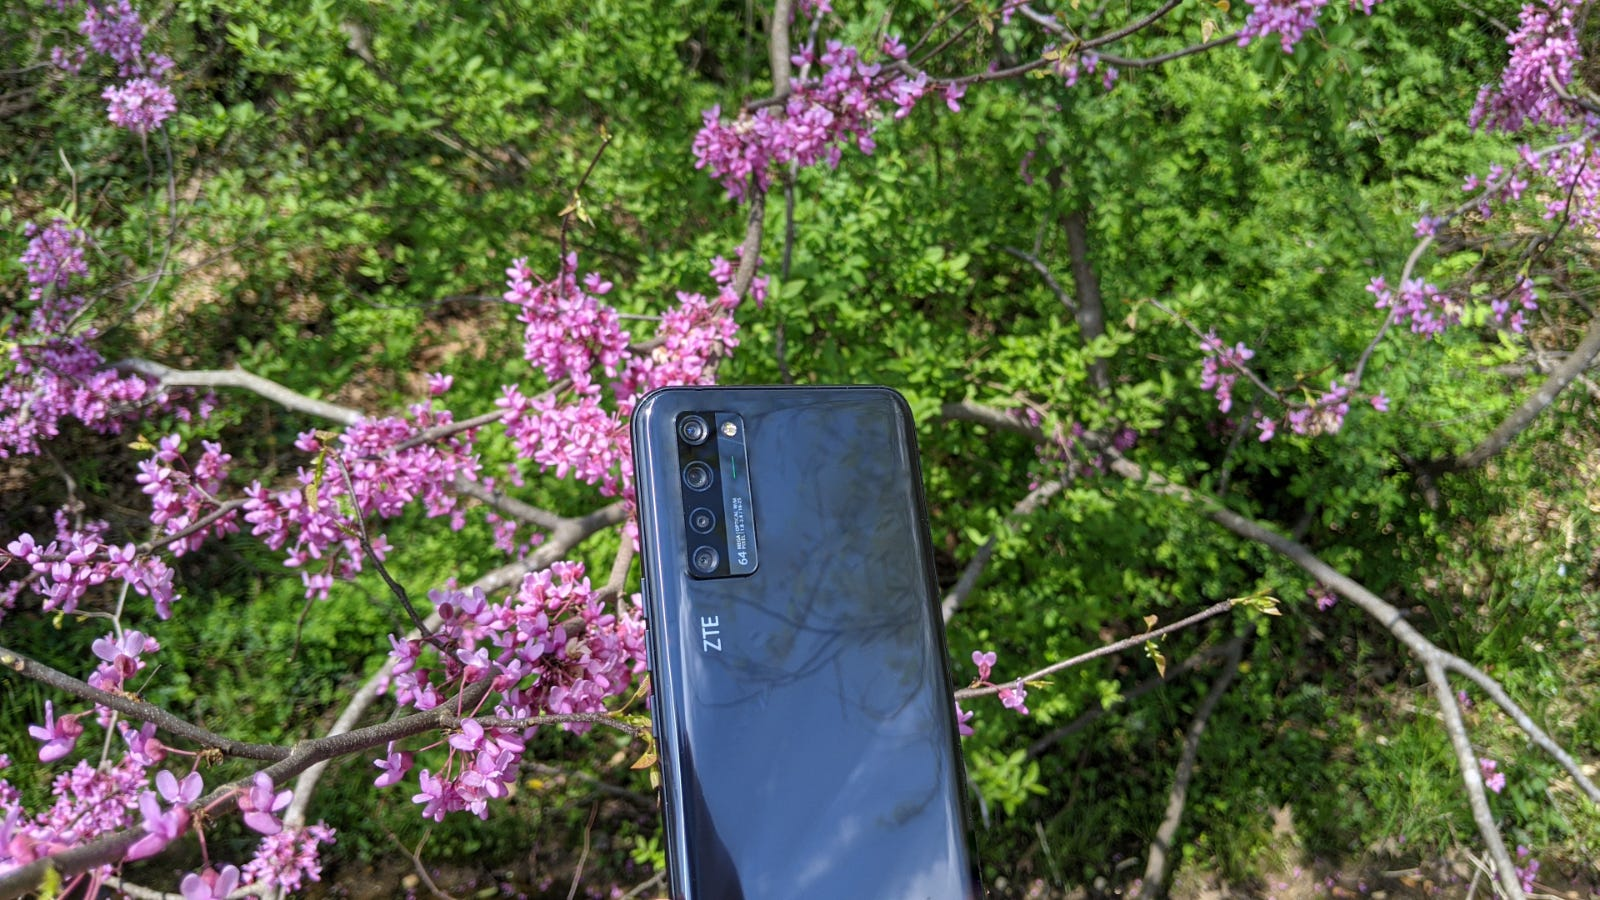 ZTE Axon 20 5G held up against flowering plant